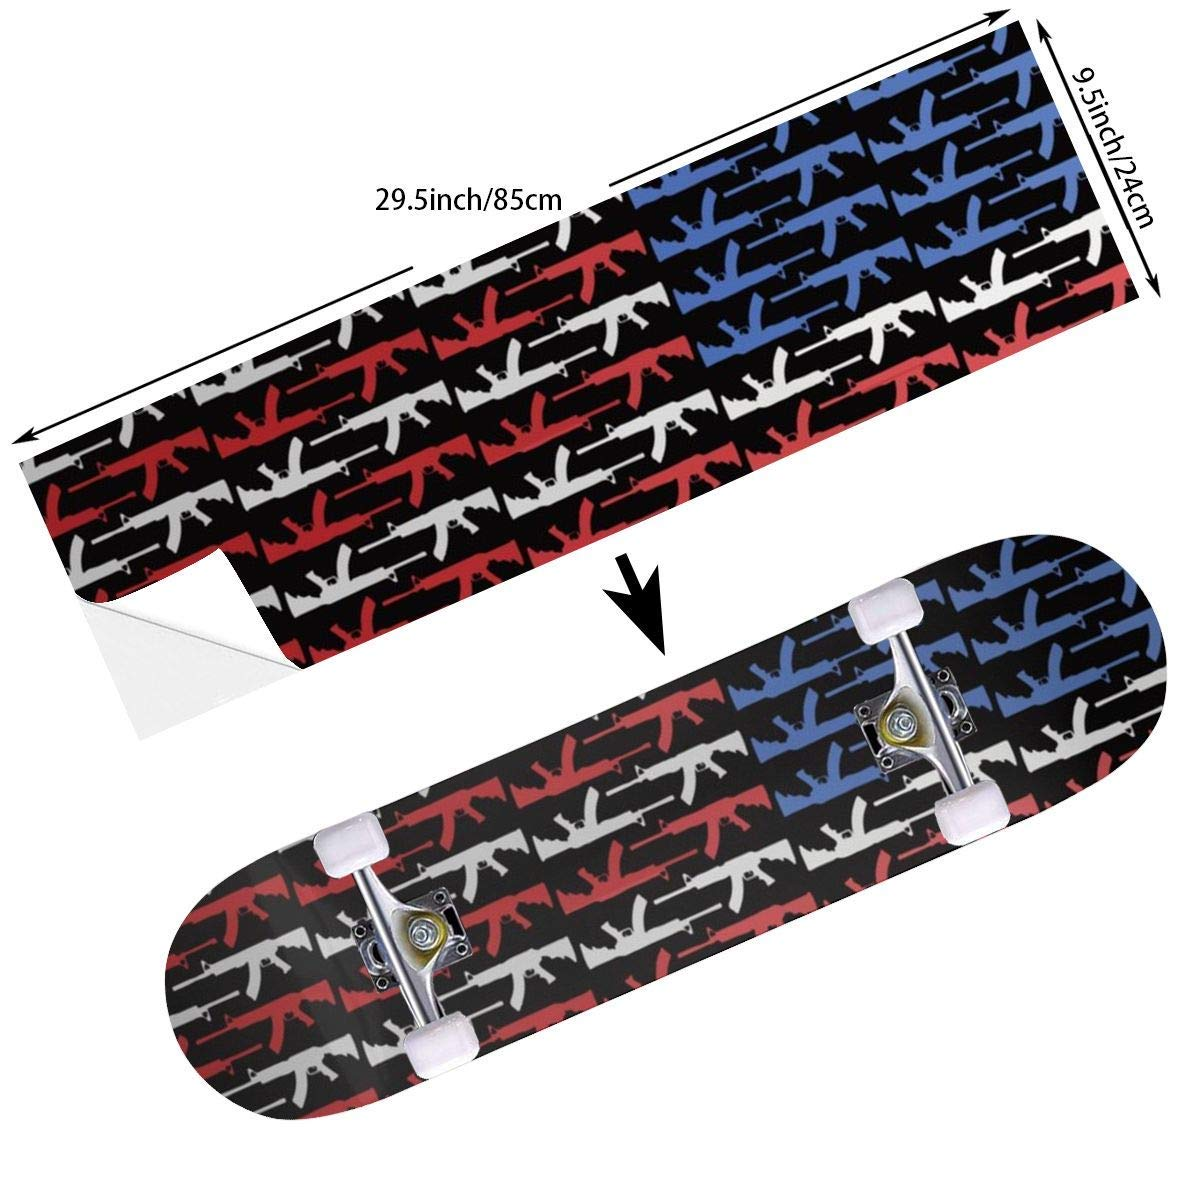 c69cc836a542 Get Quotations · DADAISM Personality American Flag Gun Type Skateboard Deck Grip  Tape - Skateistan Longboard Adhesive Griptape Sheet